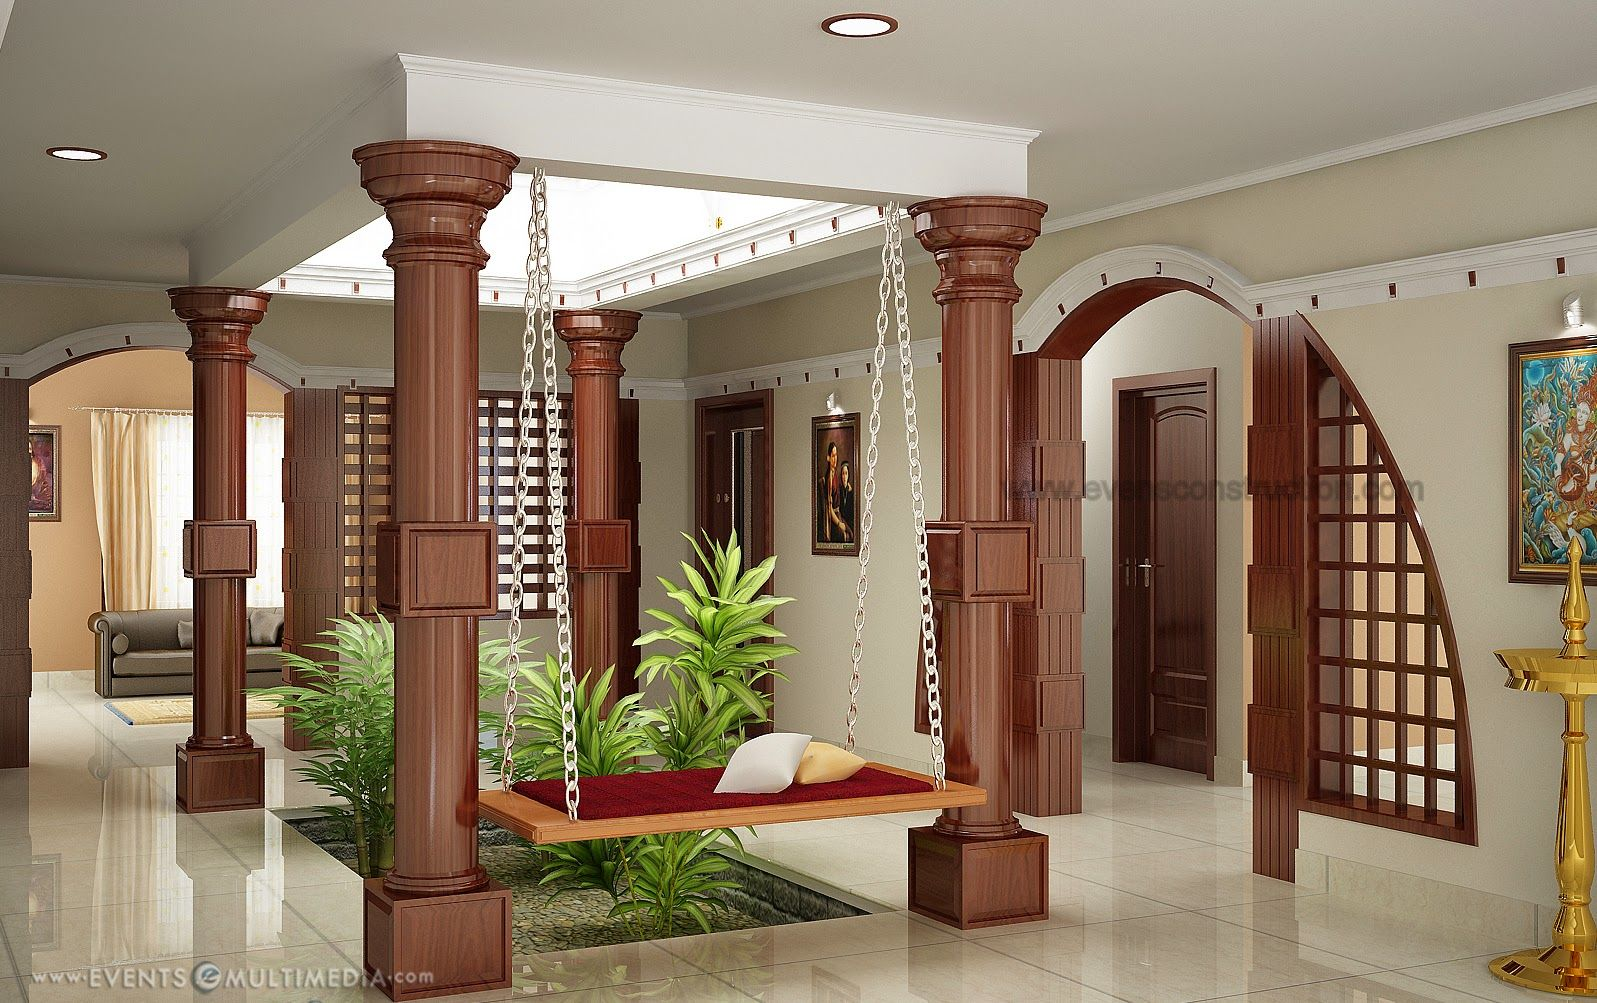 interior design kerala - Google Search | inside and ...